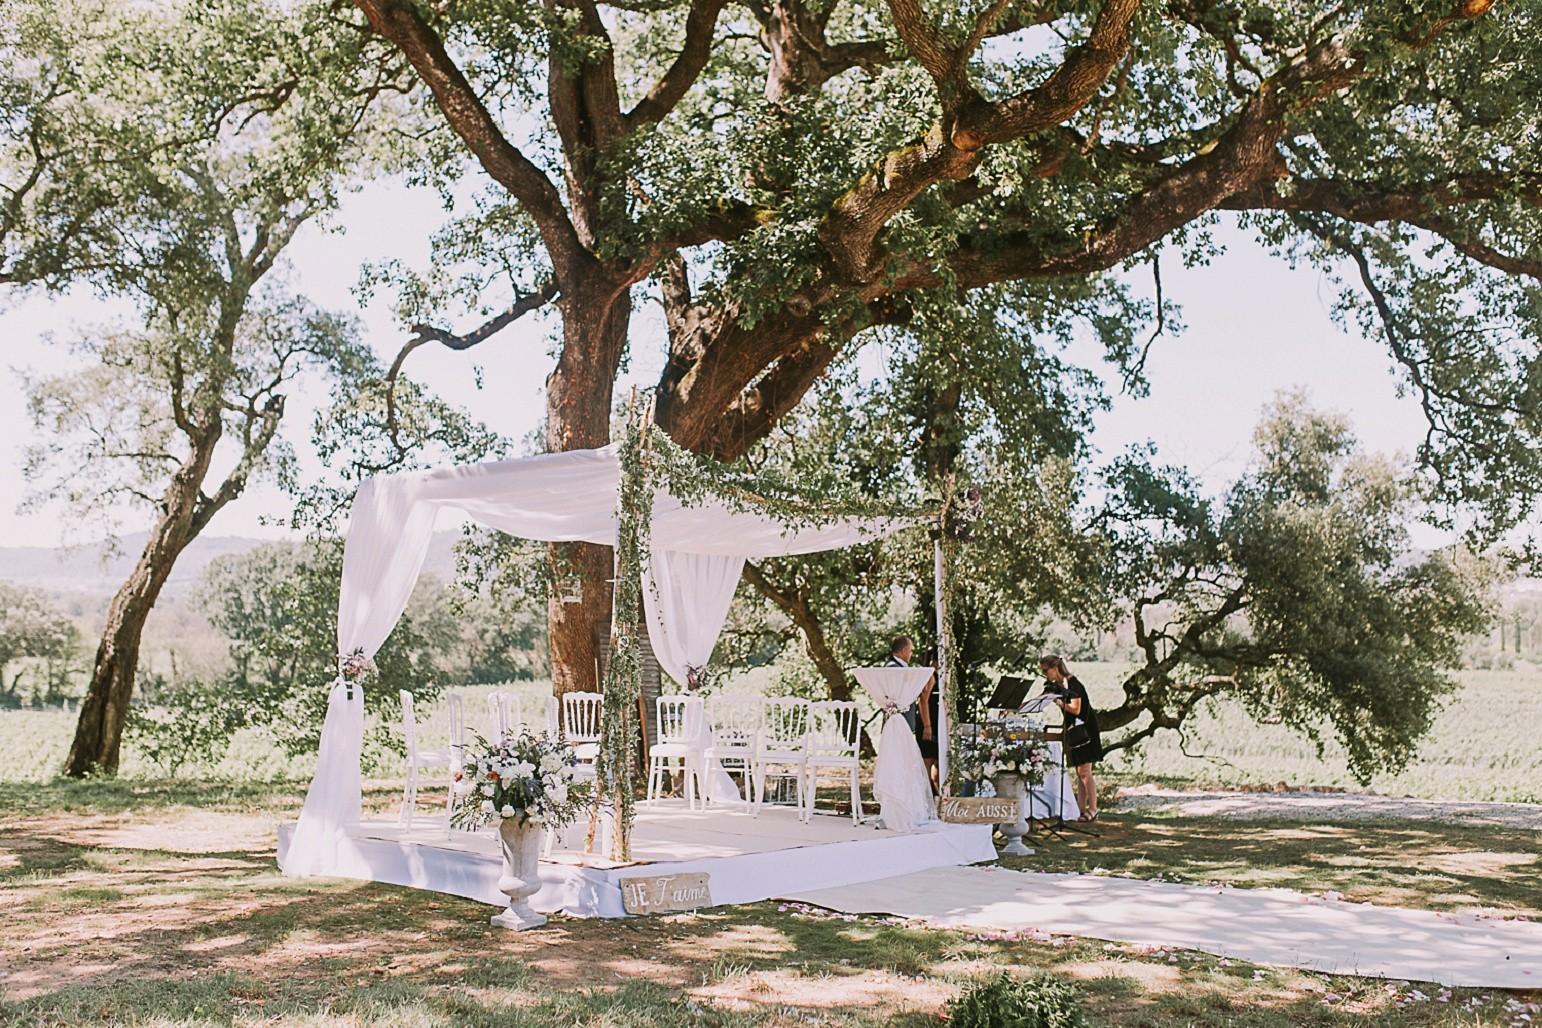 houpa-jewish-kateryna-photos-mariage-photographe-chateau-maime-aix-nice-provence-wedding-arcs-sur-argens_0031.jpg